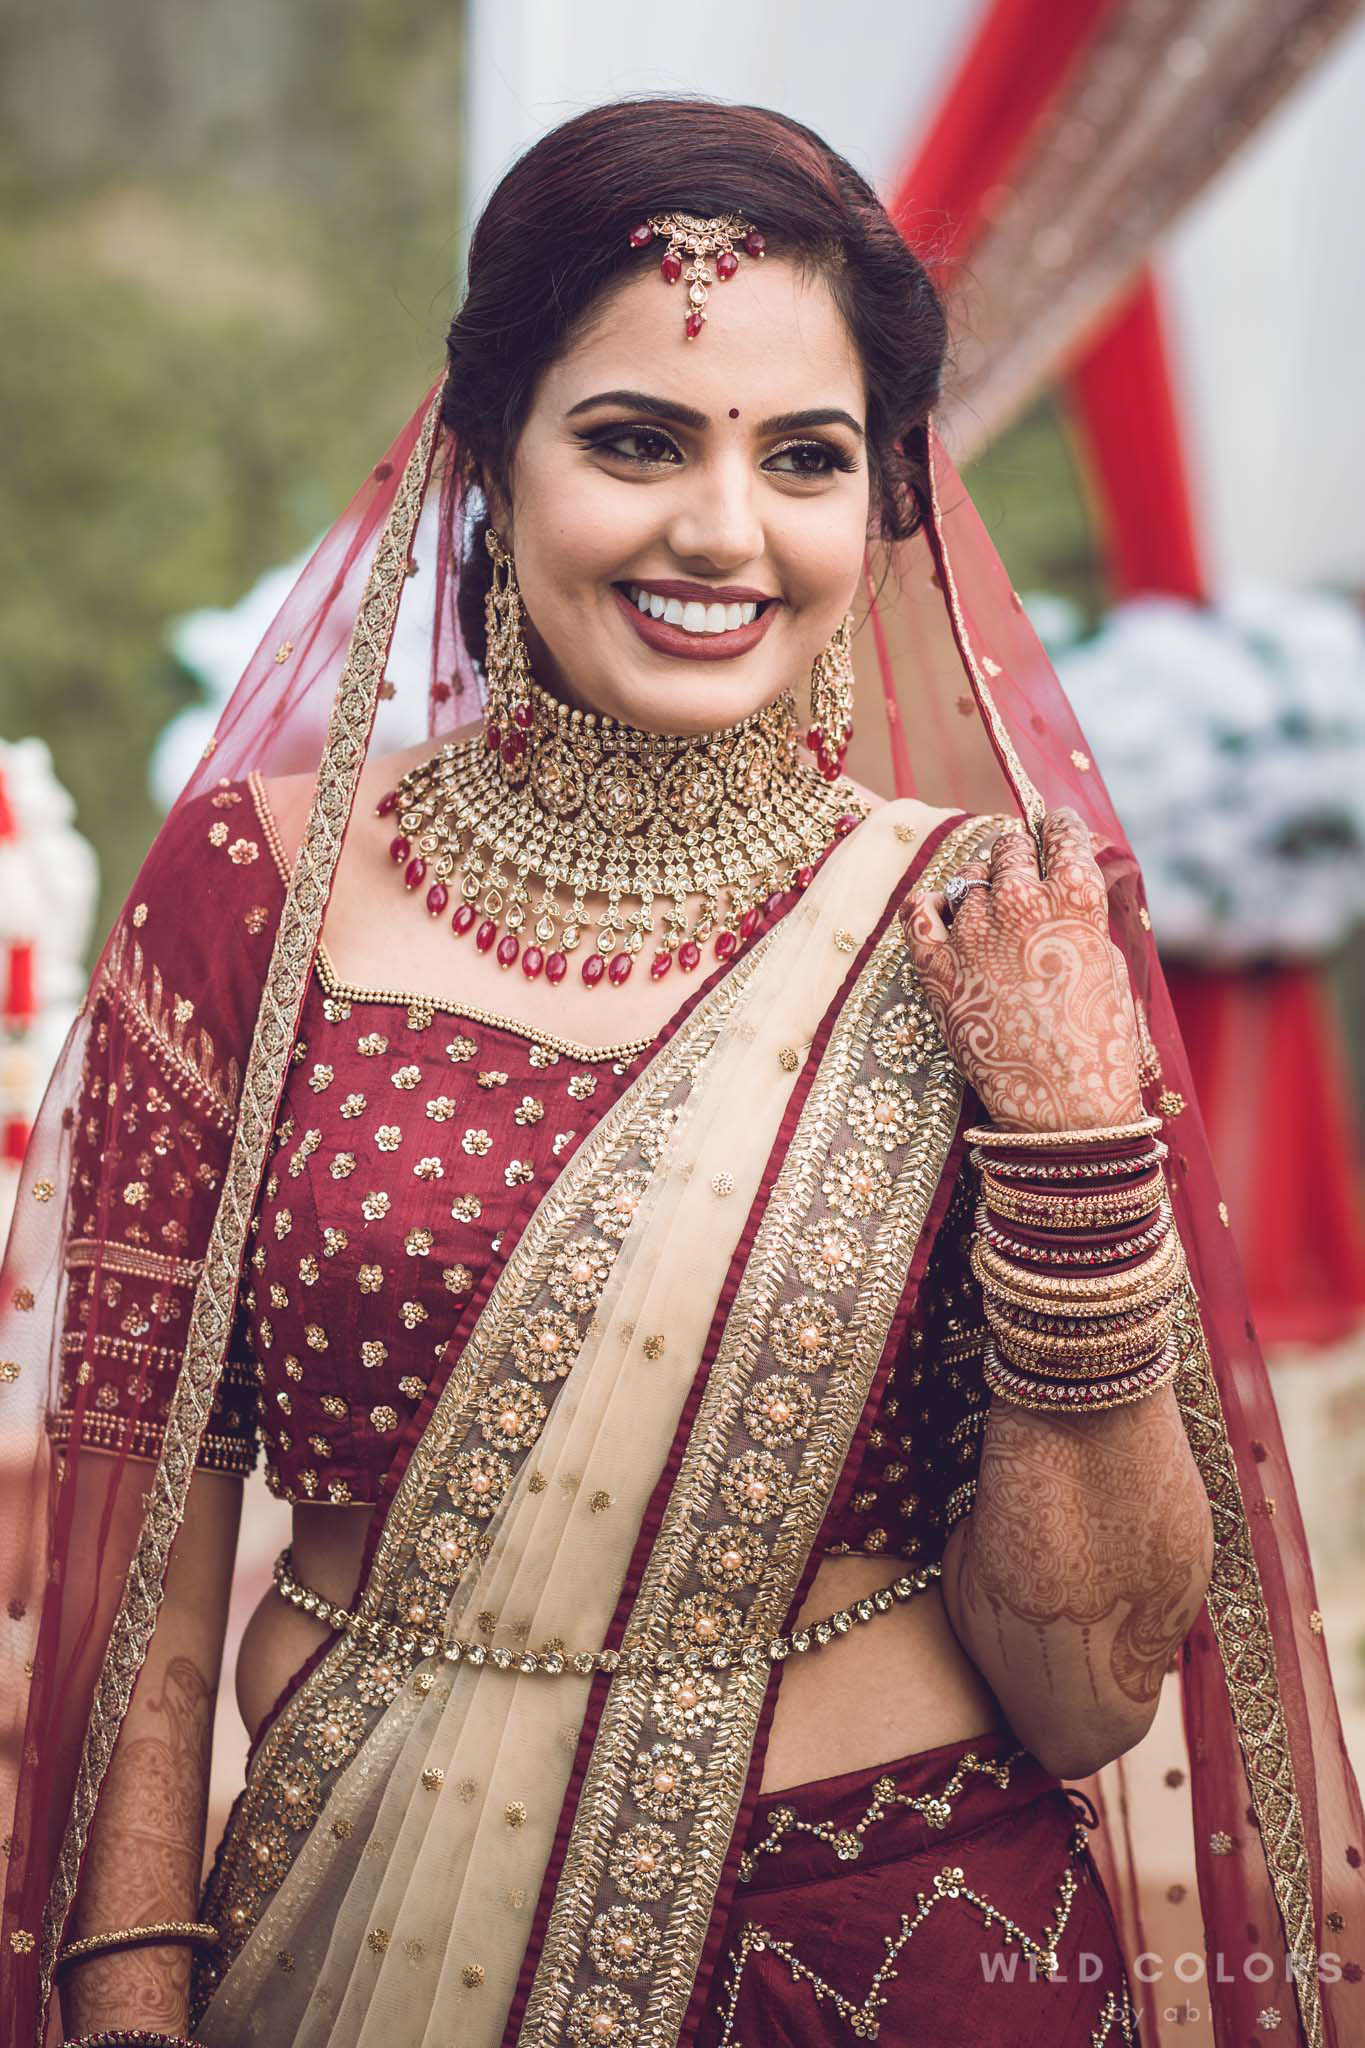 CANDID_INDIAN_WEDDING_ATLANTA_PHOTOGRAPHER-30.JPG